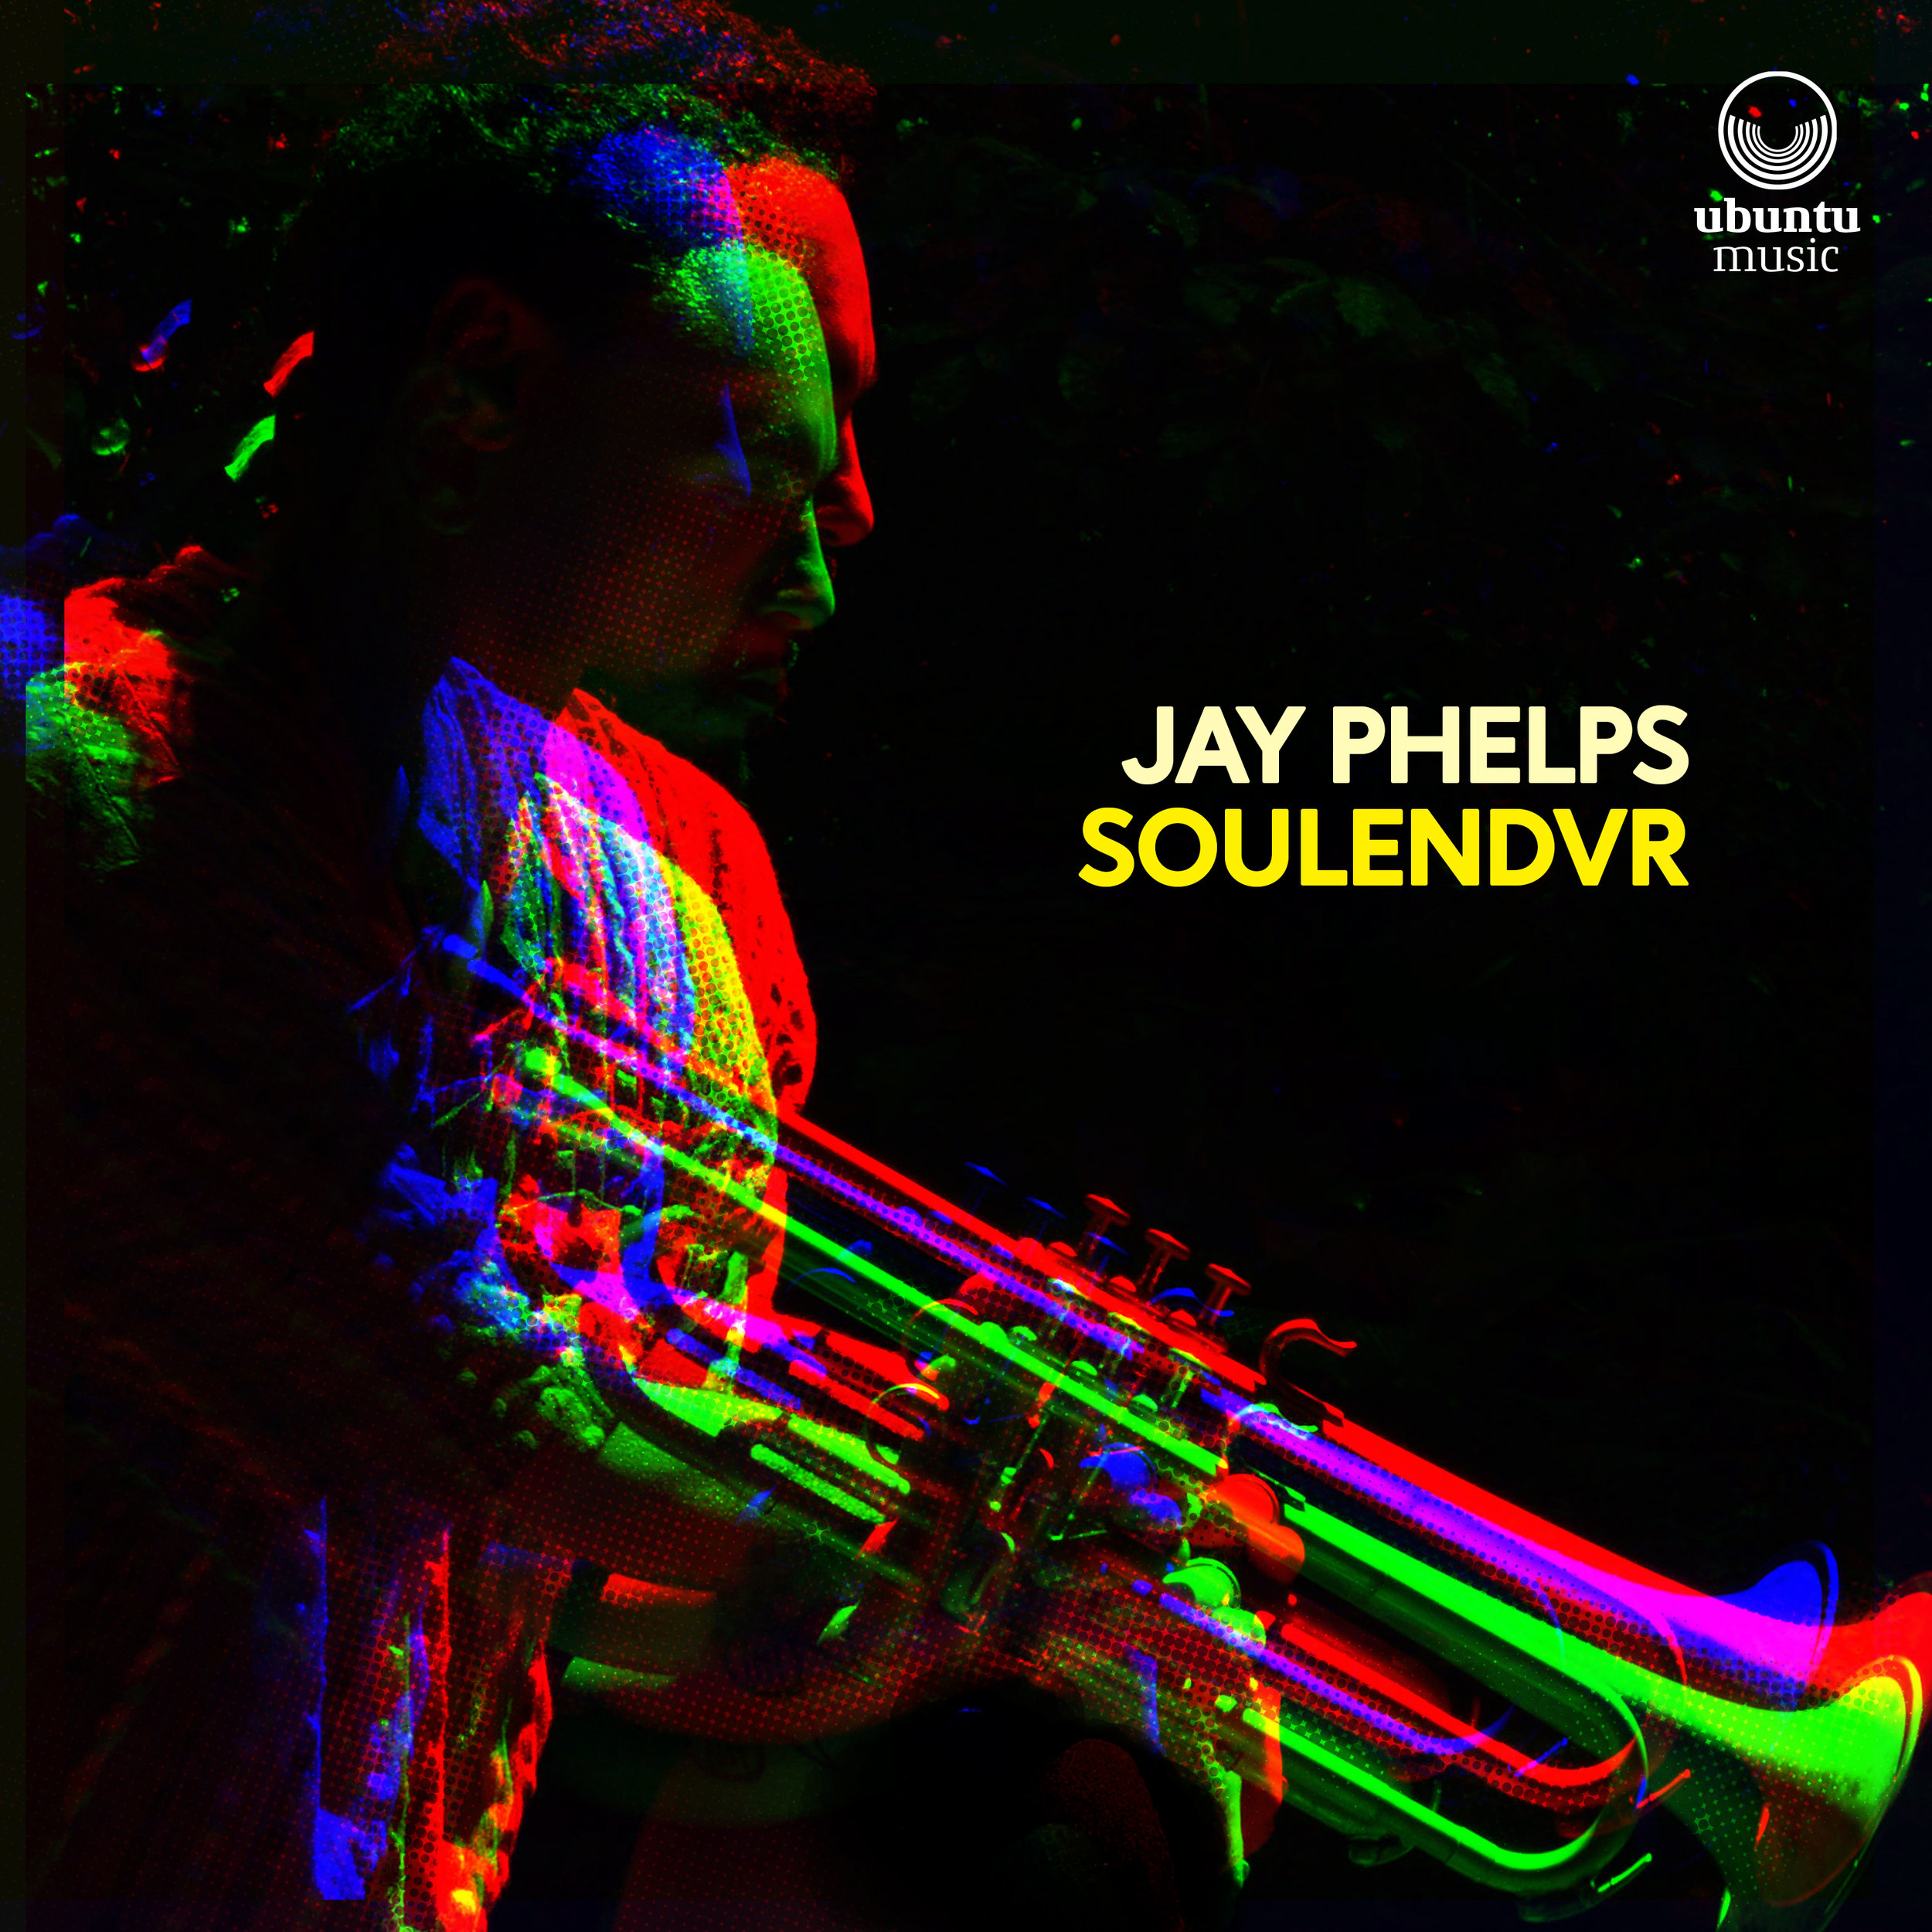 UBU0038_Jay Phelps_SoulEndvr_Cover.jpg.jpg